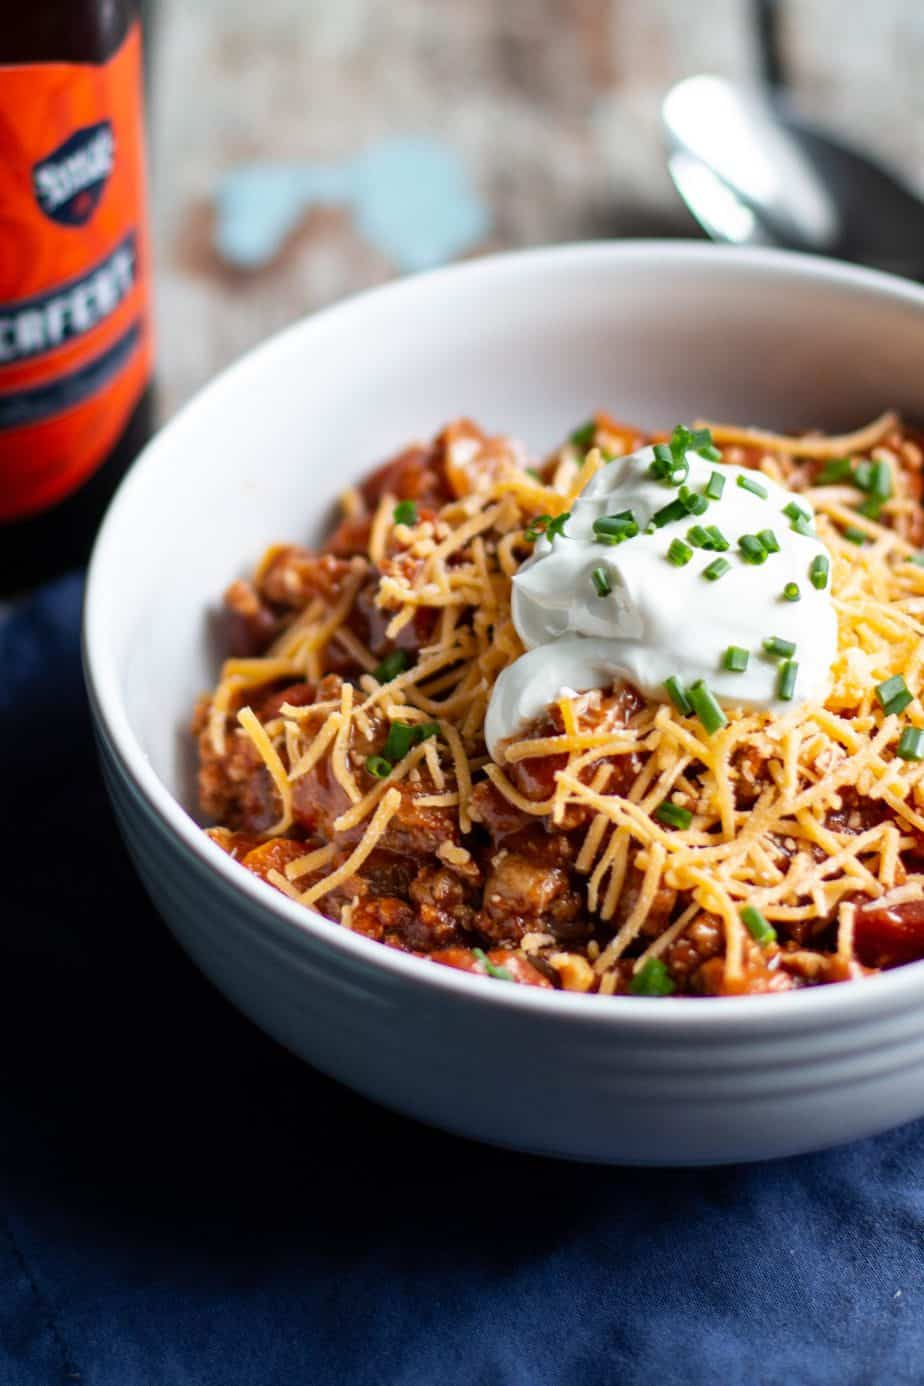 Slow Cooker Turkey Chili | A Nerd Cooks